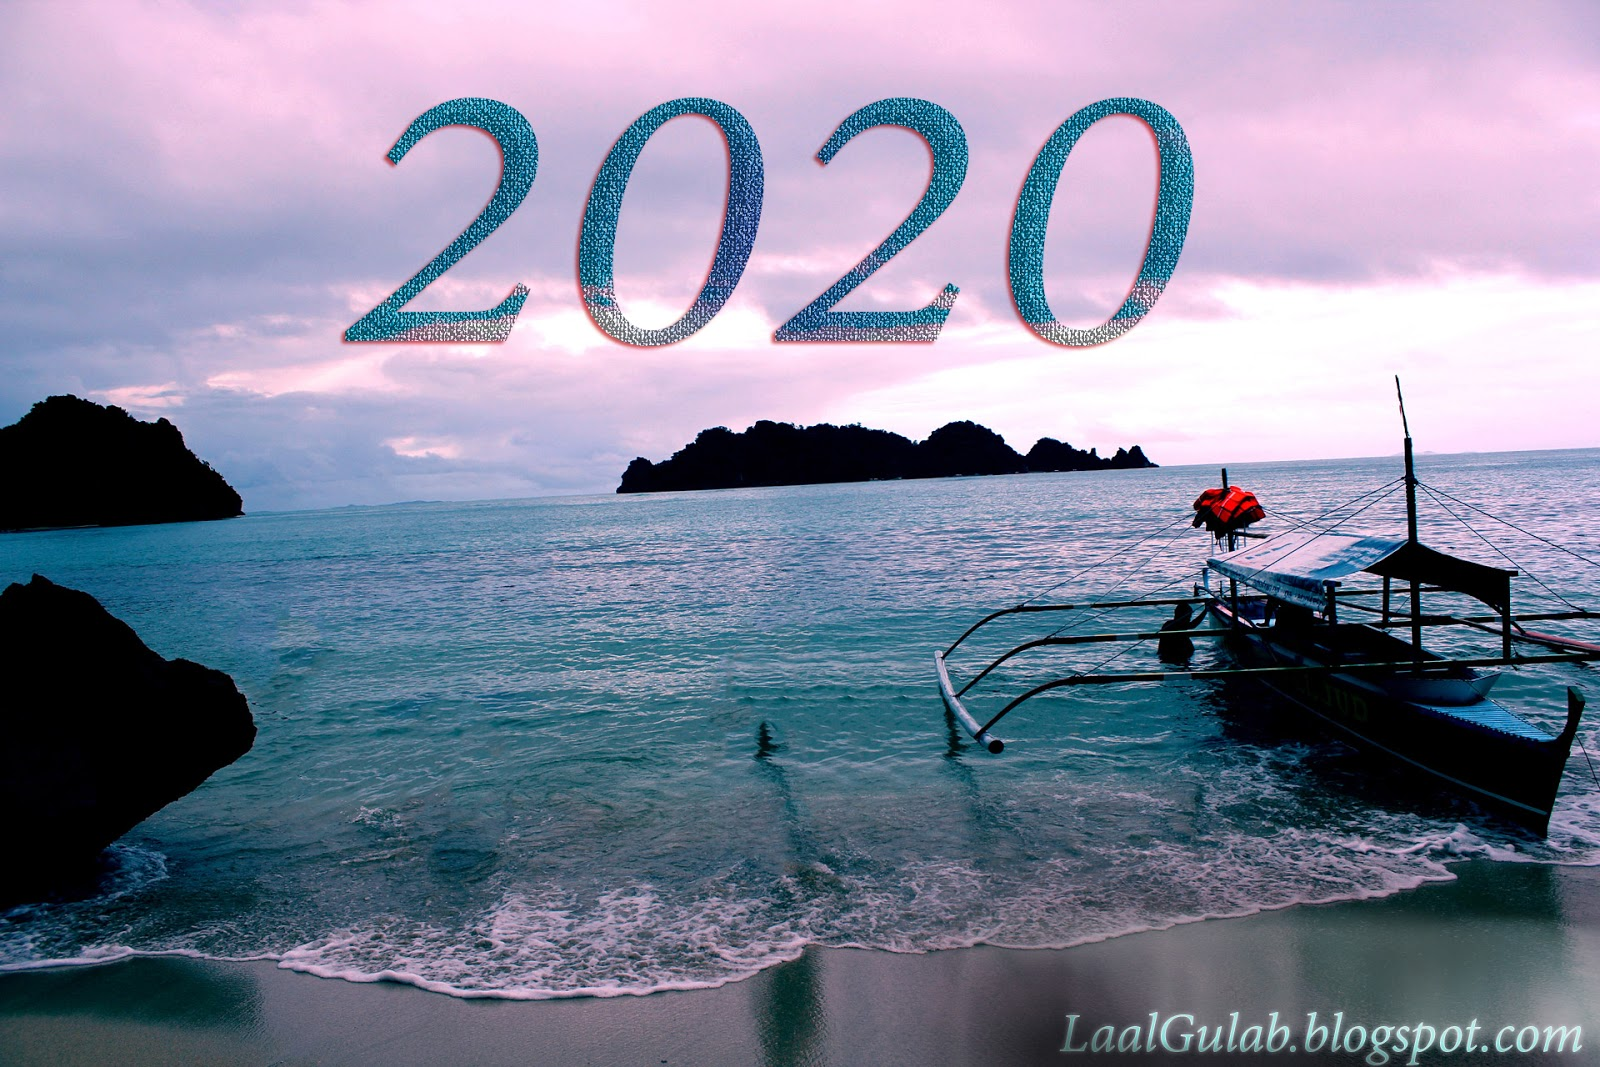 hd ocean 2020 wallpaper